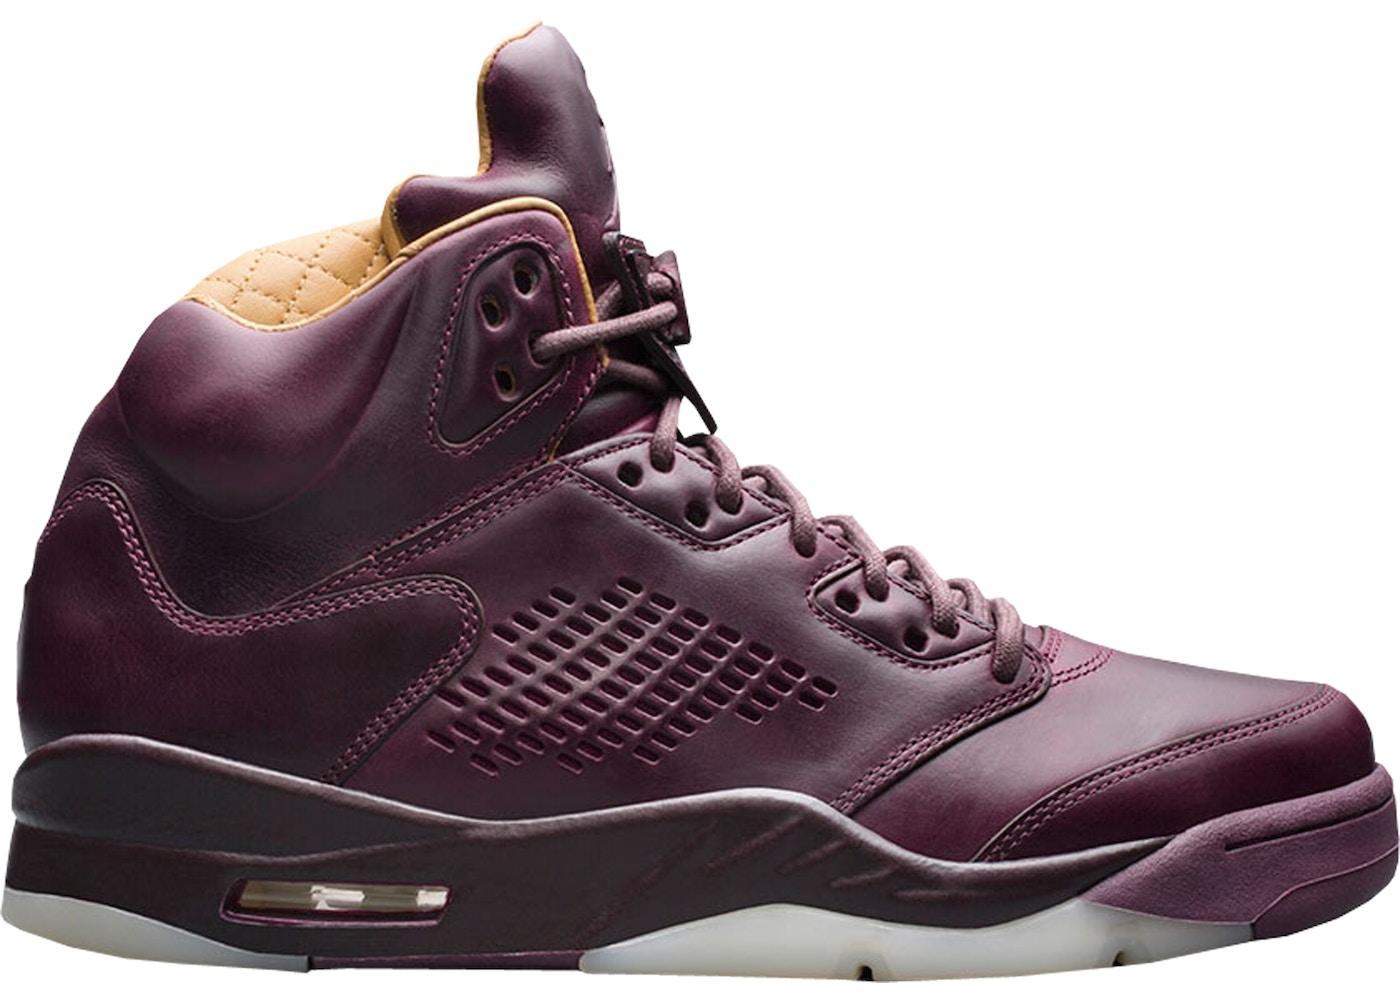 Air Jordan 5 Especial